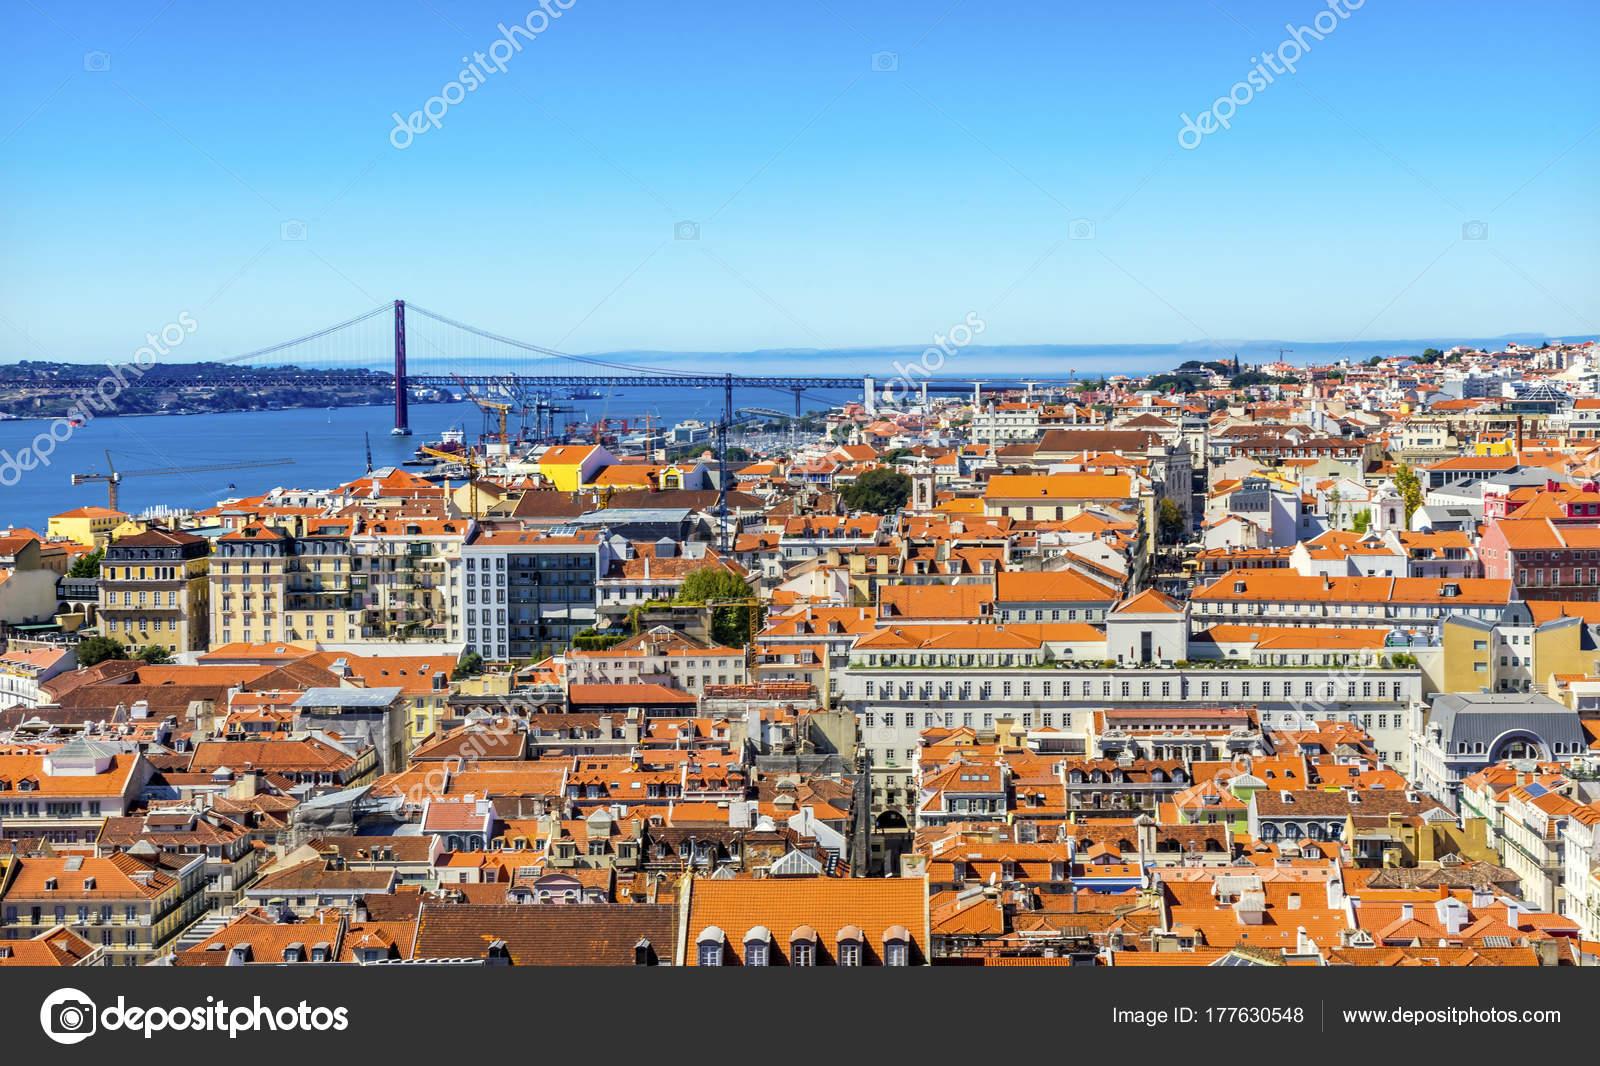 Lissabon Fluss tejo fluss brücke 25 april orange dächer lissabon portugal